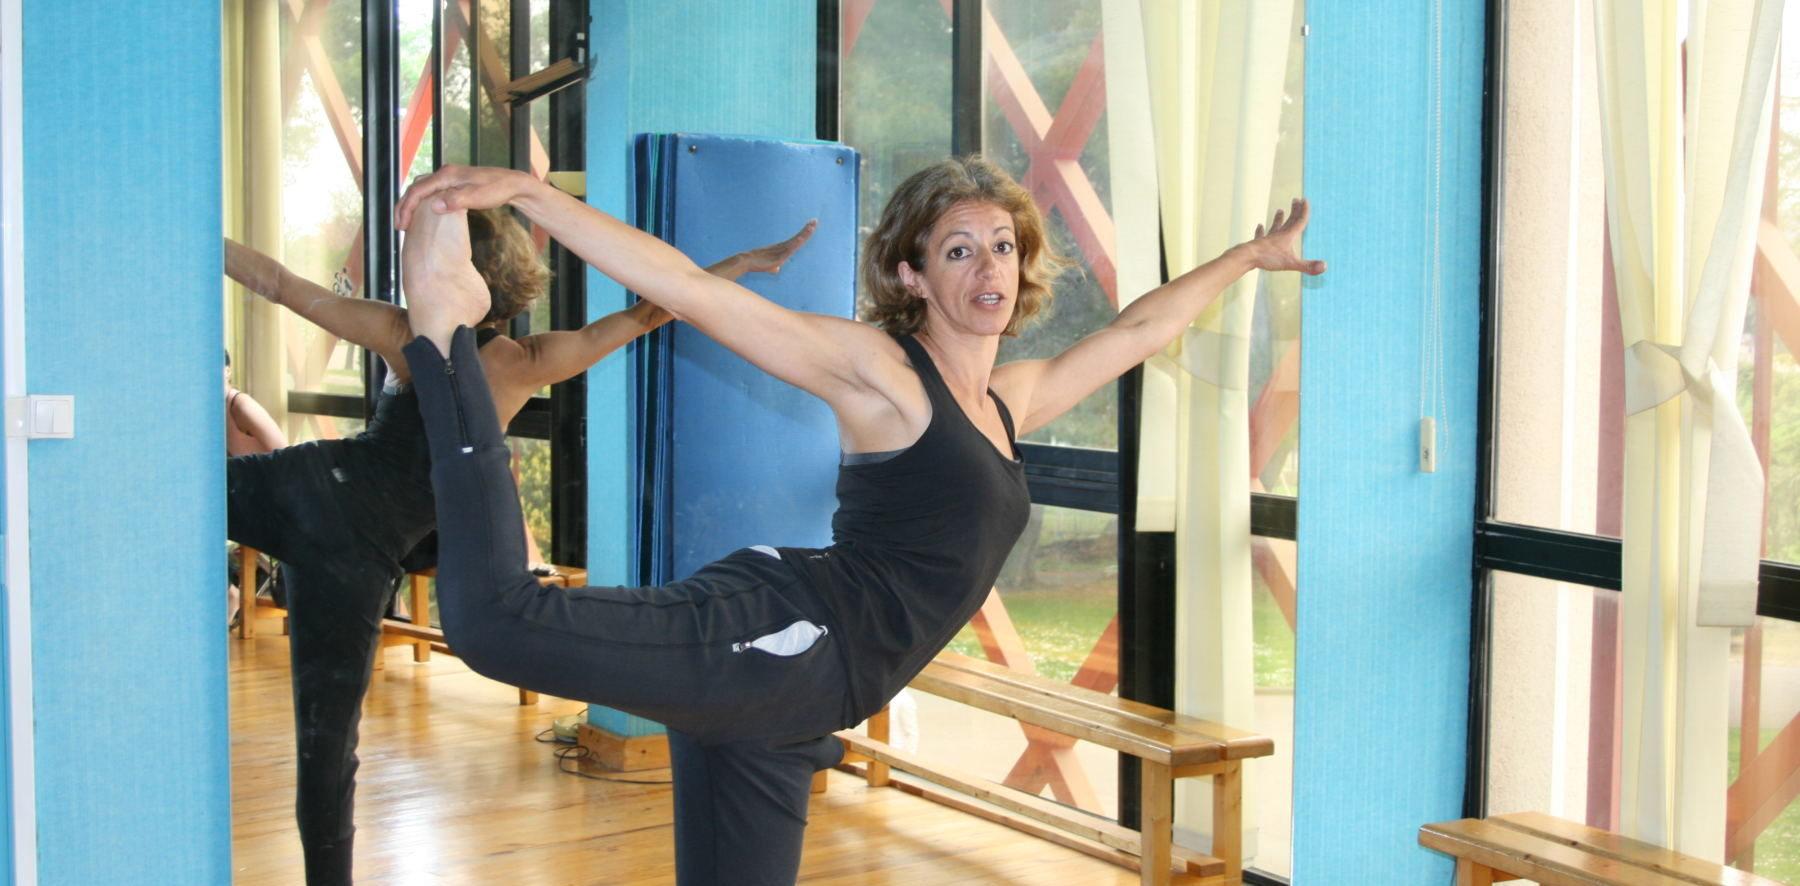 ACAD - Yoga - Gym-fitness